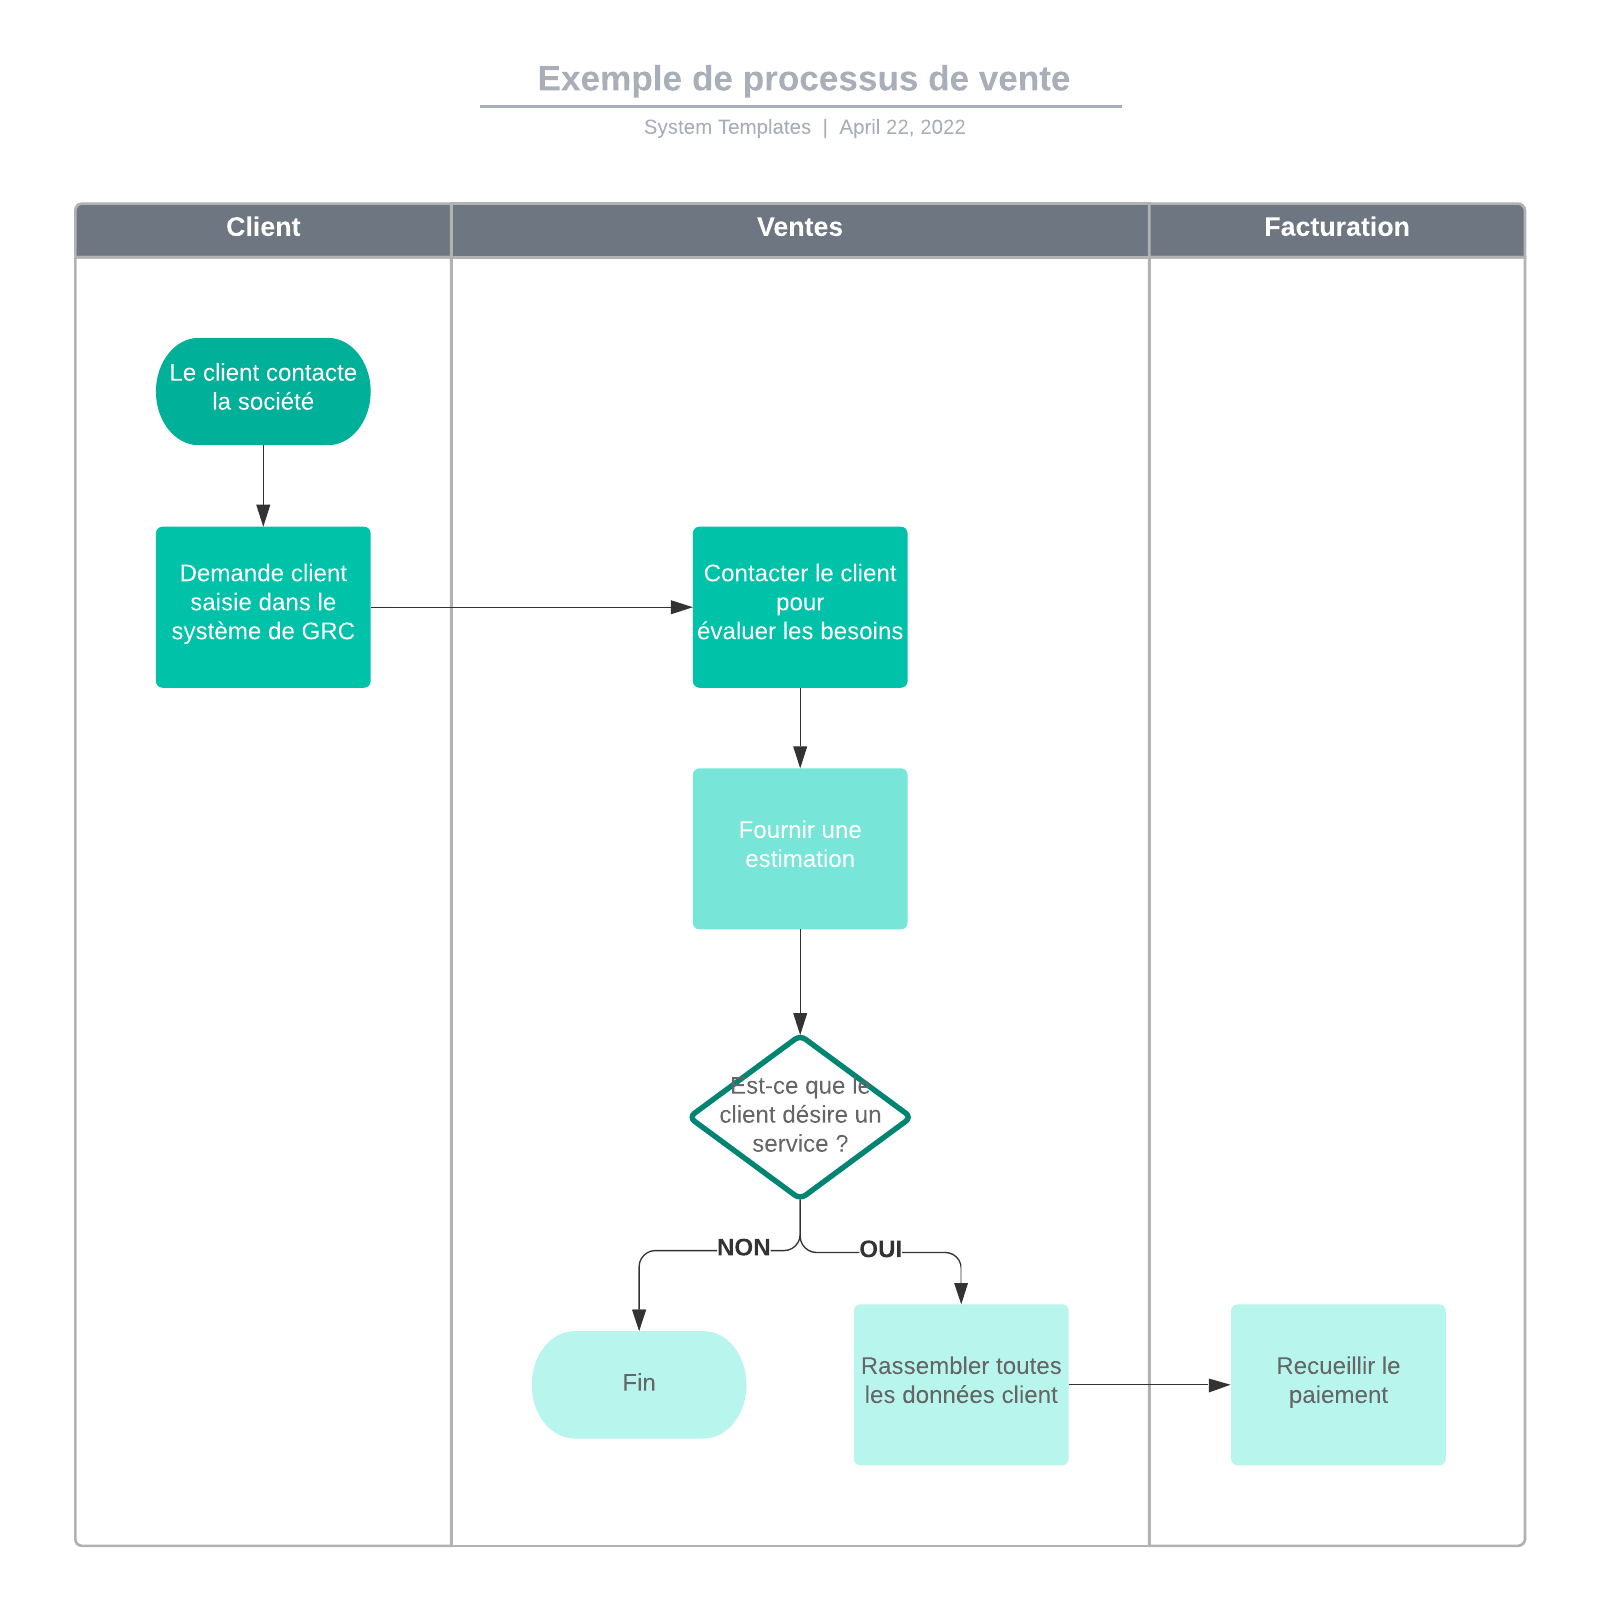 exemple de processus de vente